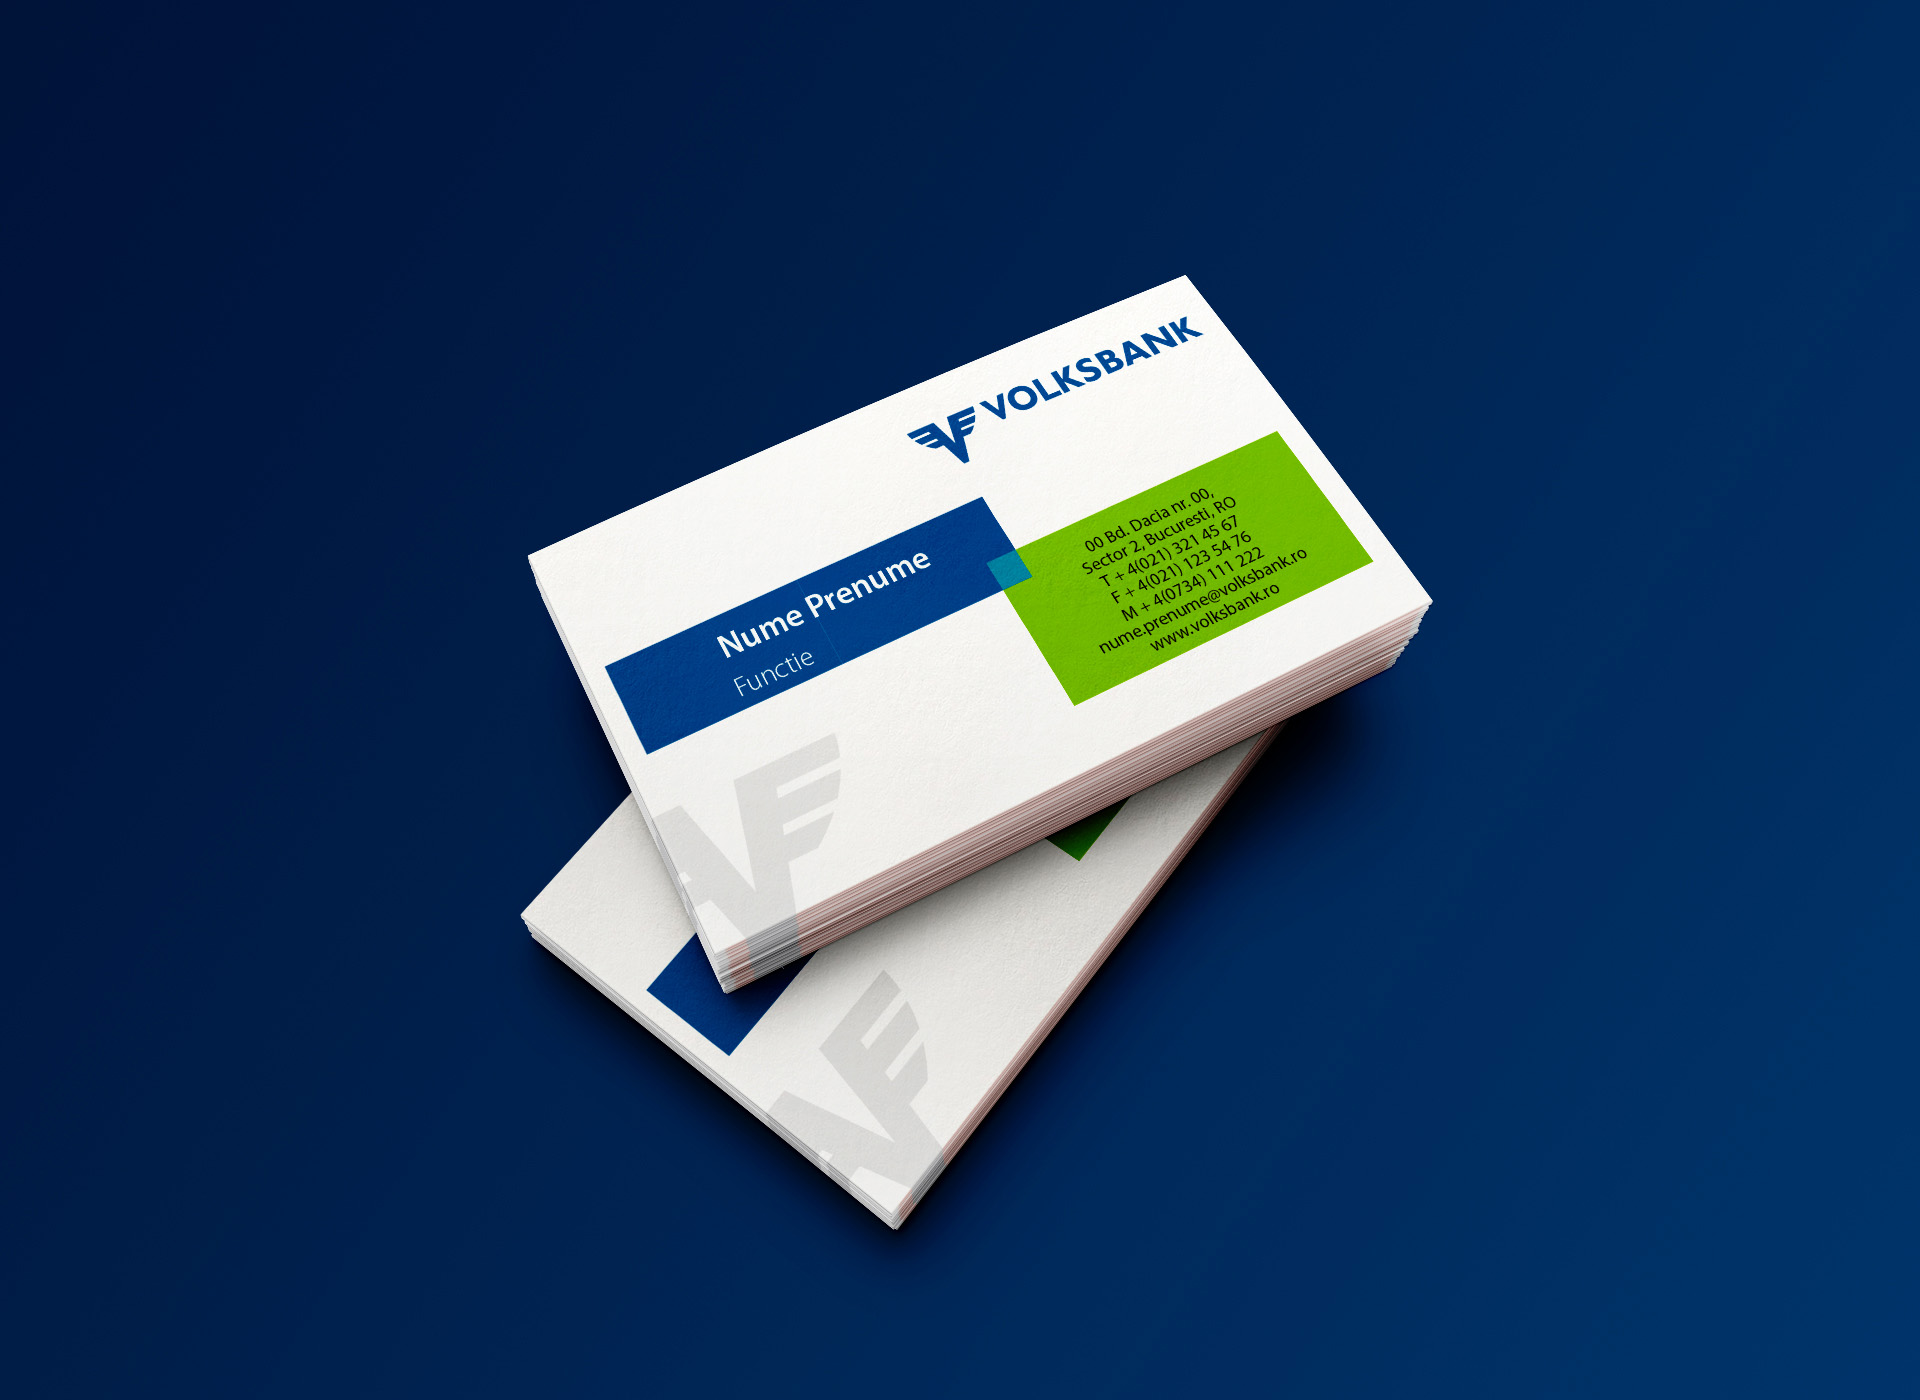 volksbank business card portofoliu inoveo